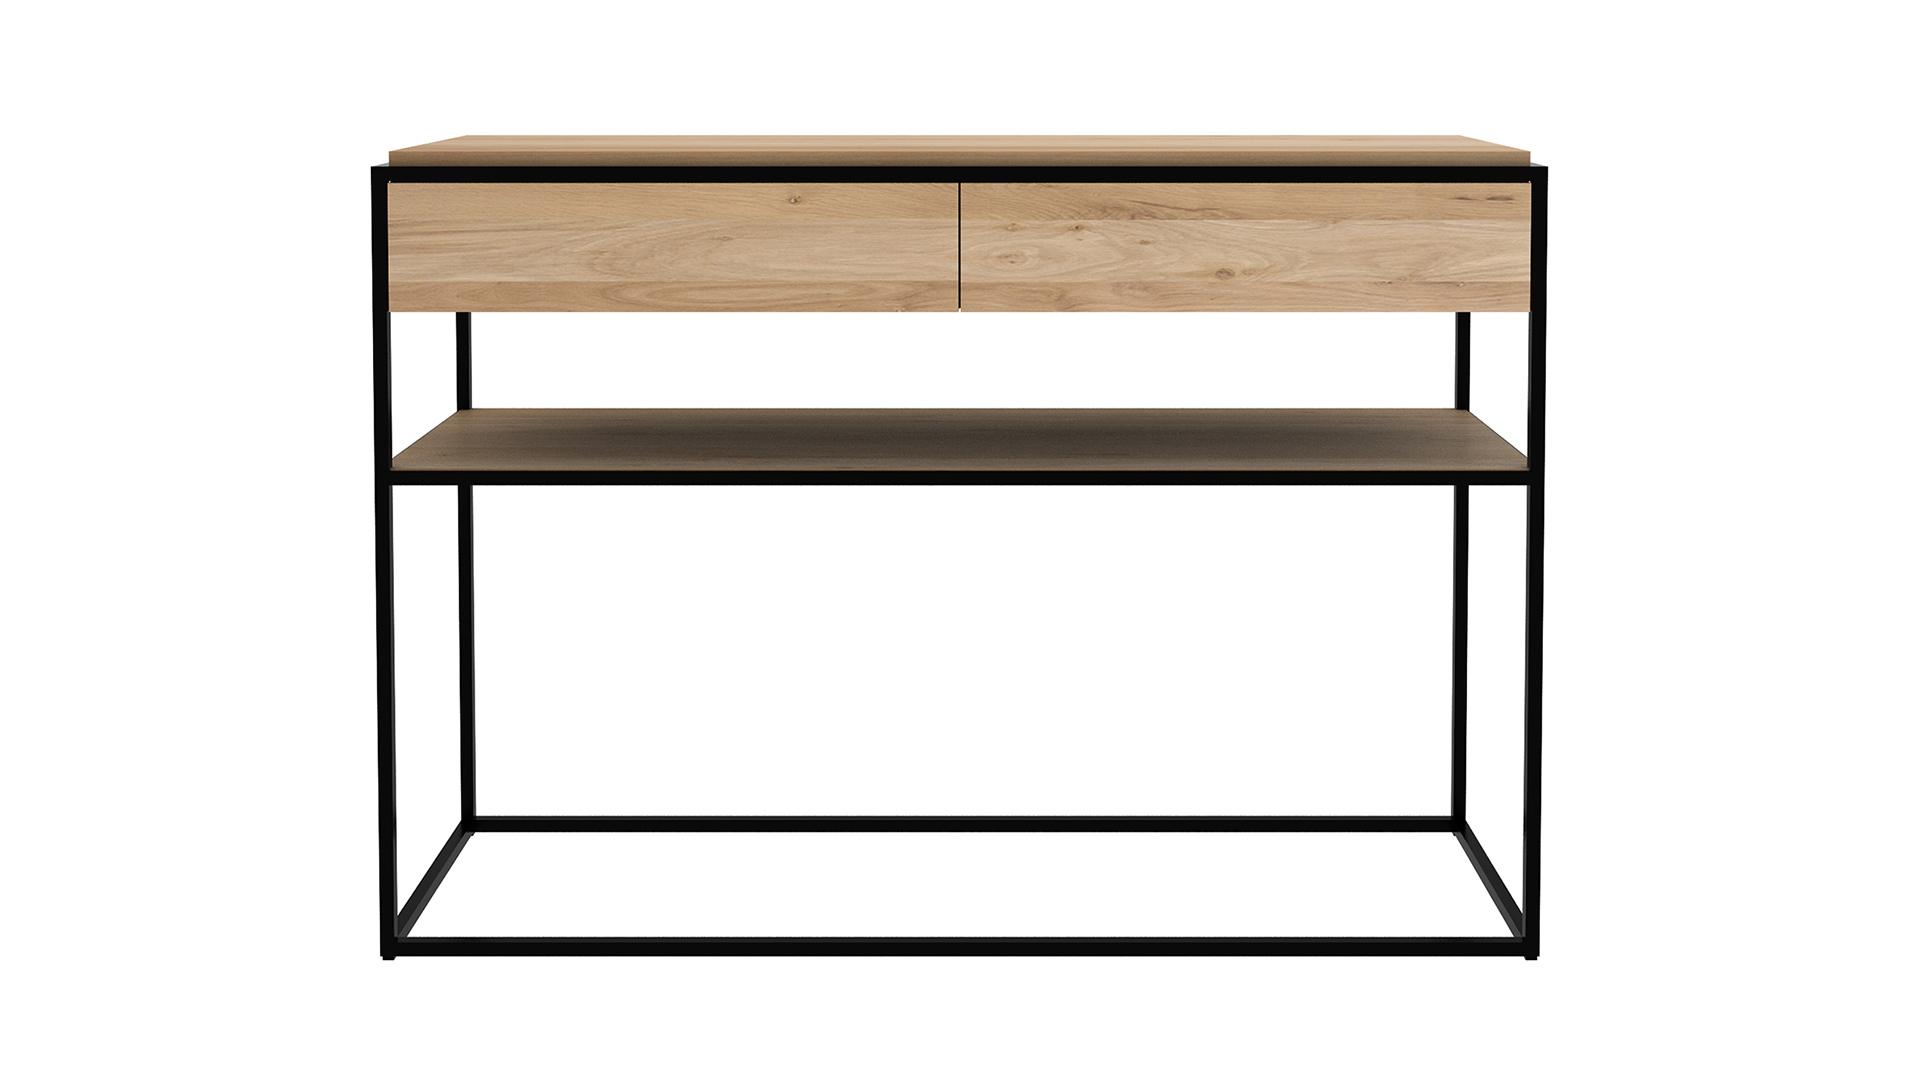 Ethnicraft-Oak-Monolit-console